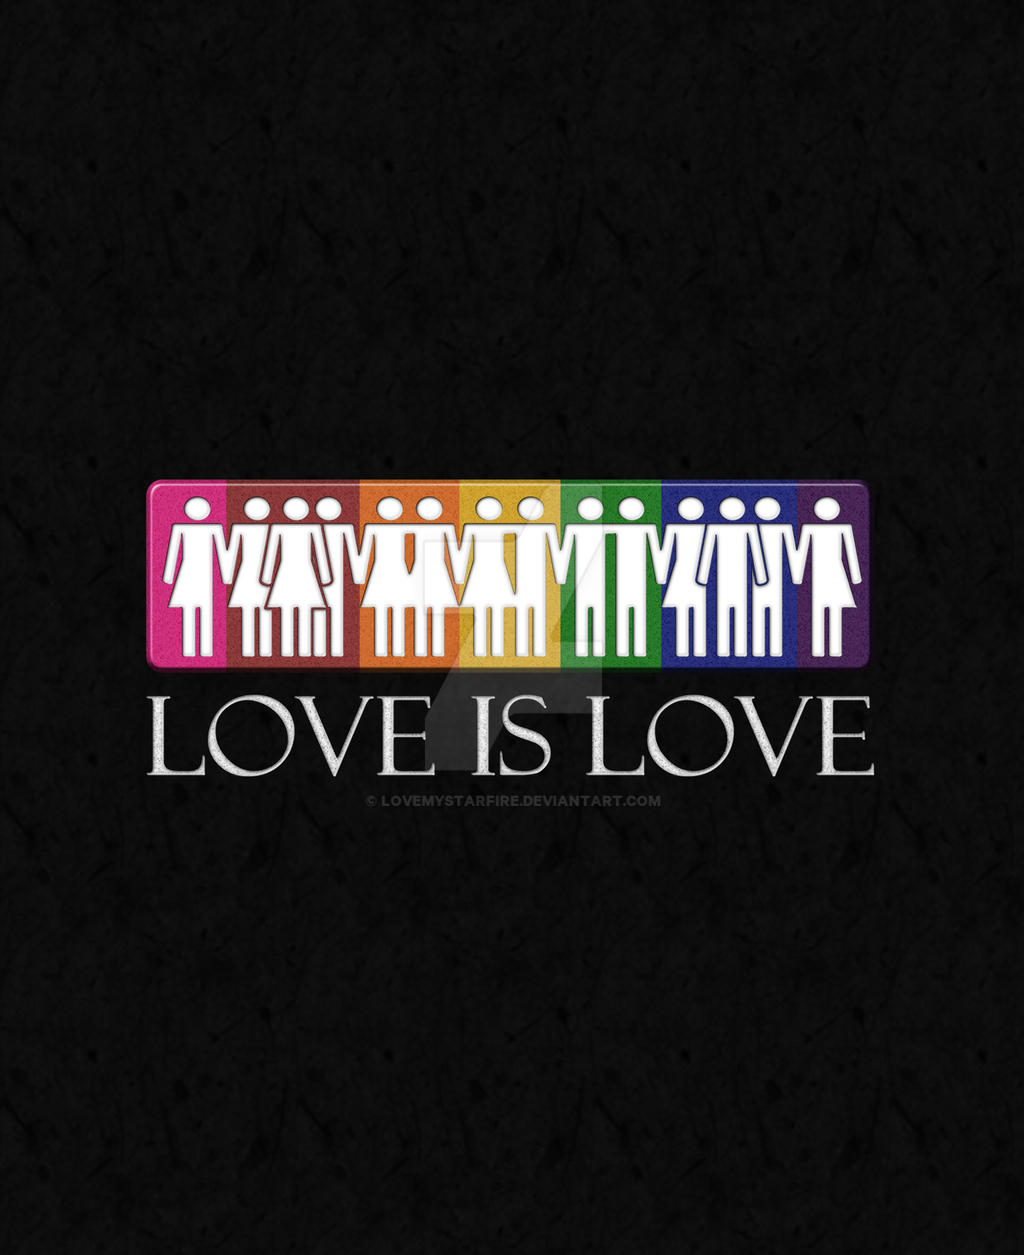 Lgbt Love Quotes Love Is Love  Lgbt Equalitylovemystarfire On Deviantart